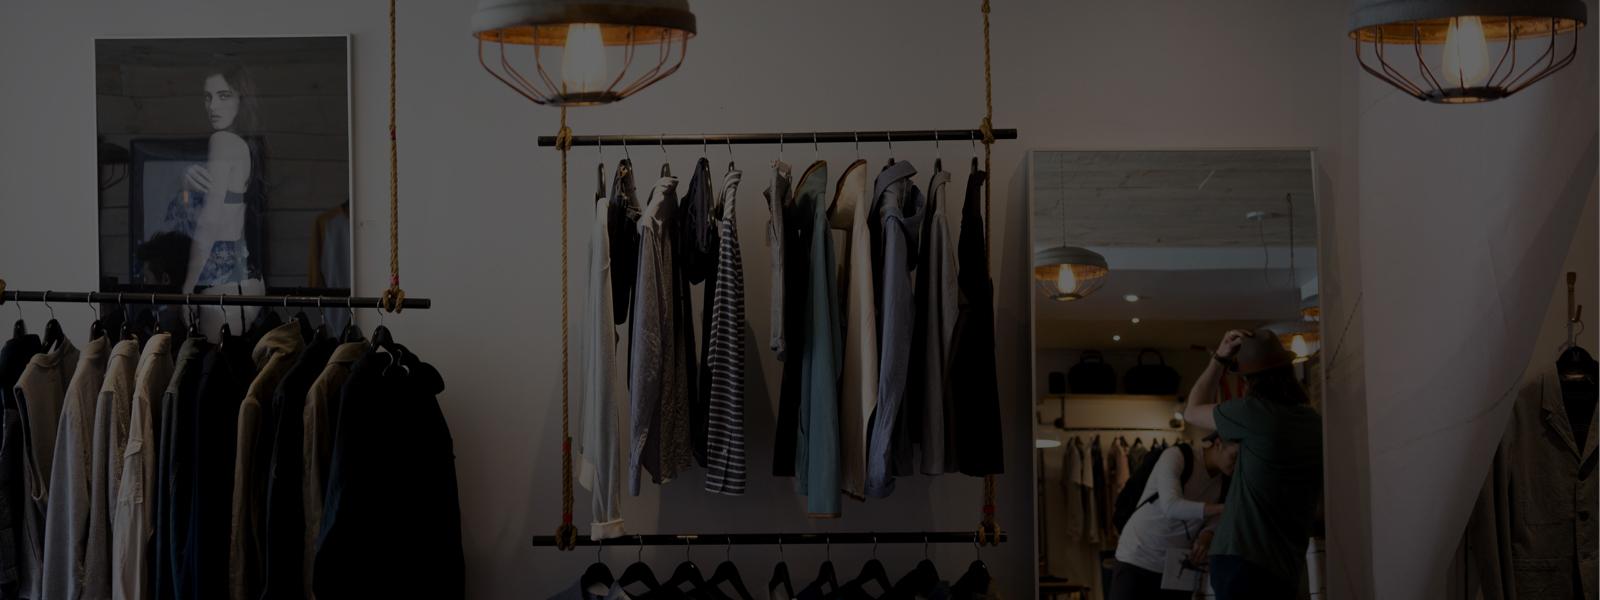 fondo_black_50percent_retail